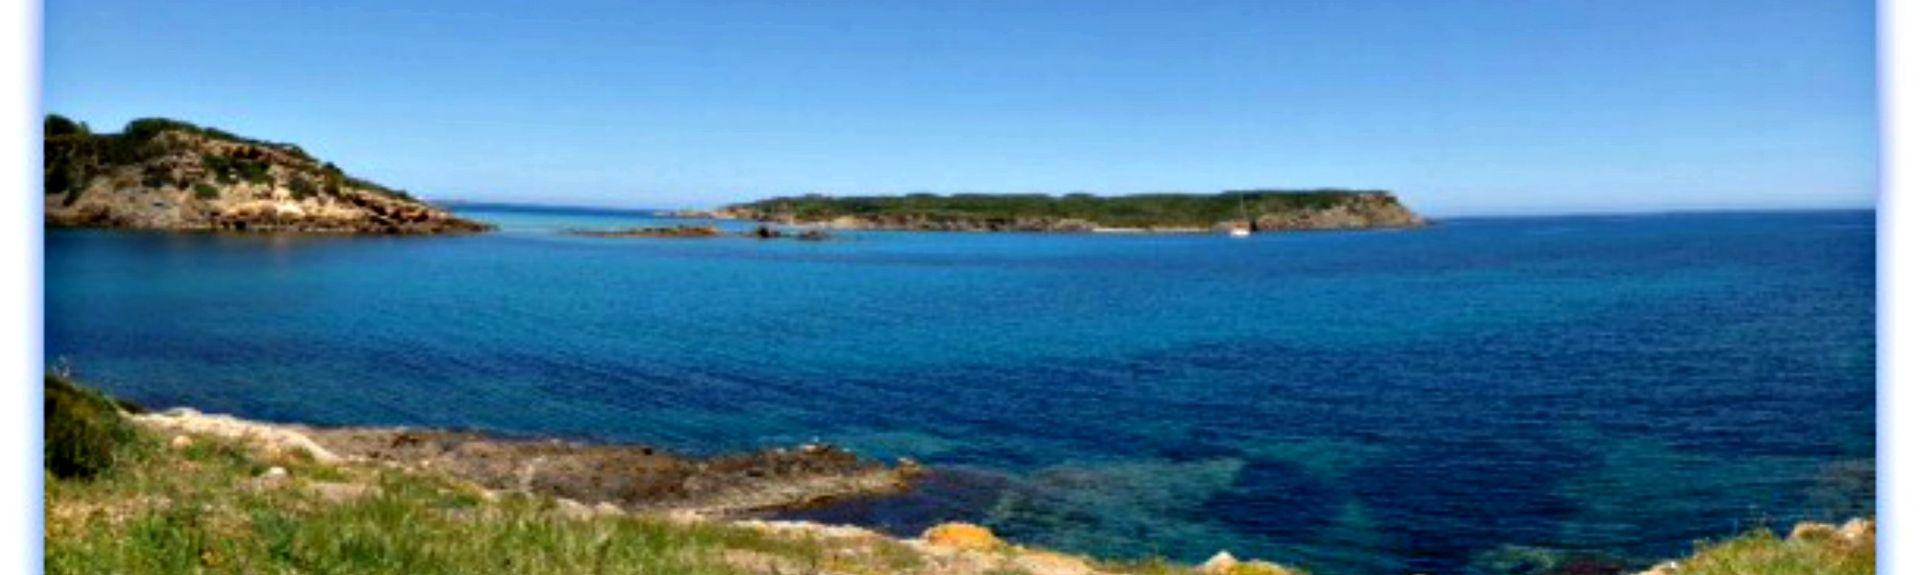 Son Vitamina, Balearic Islands, Spain